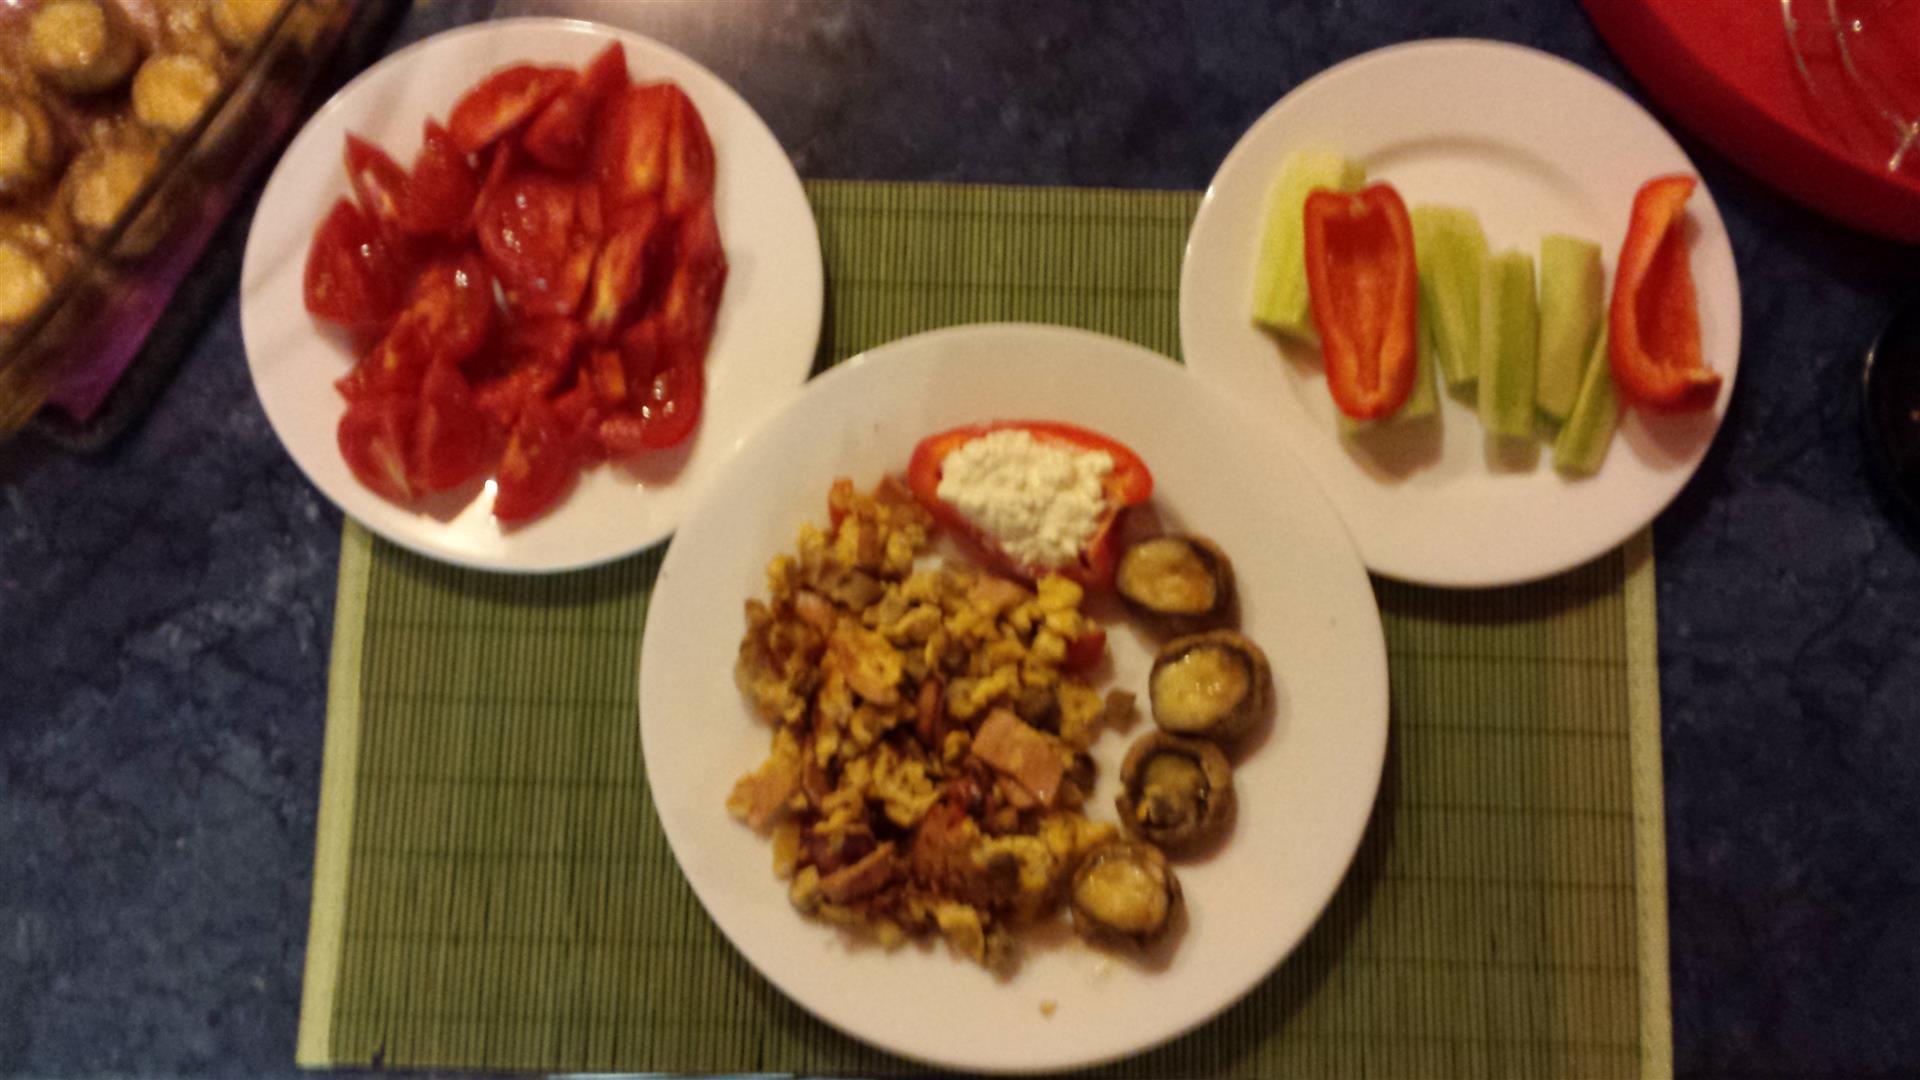 prinbrasovulmeu-2015-ziua-2-4-sep-poze (1)-mic-dejun